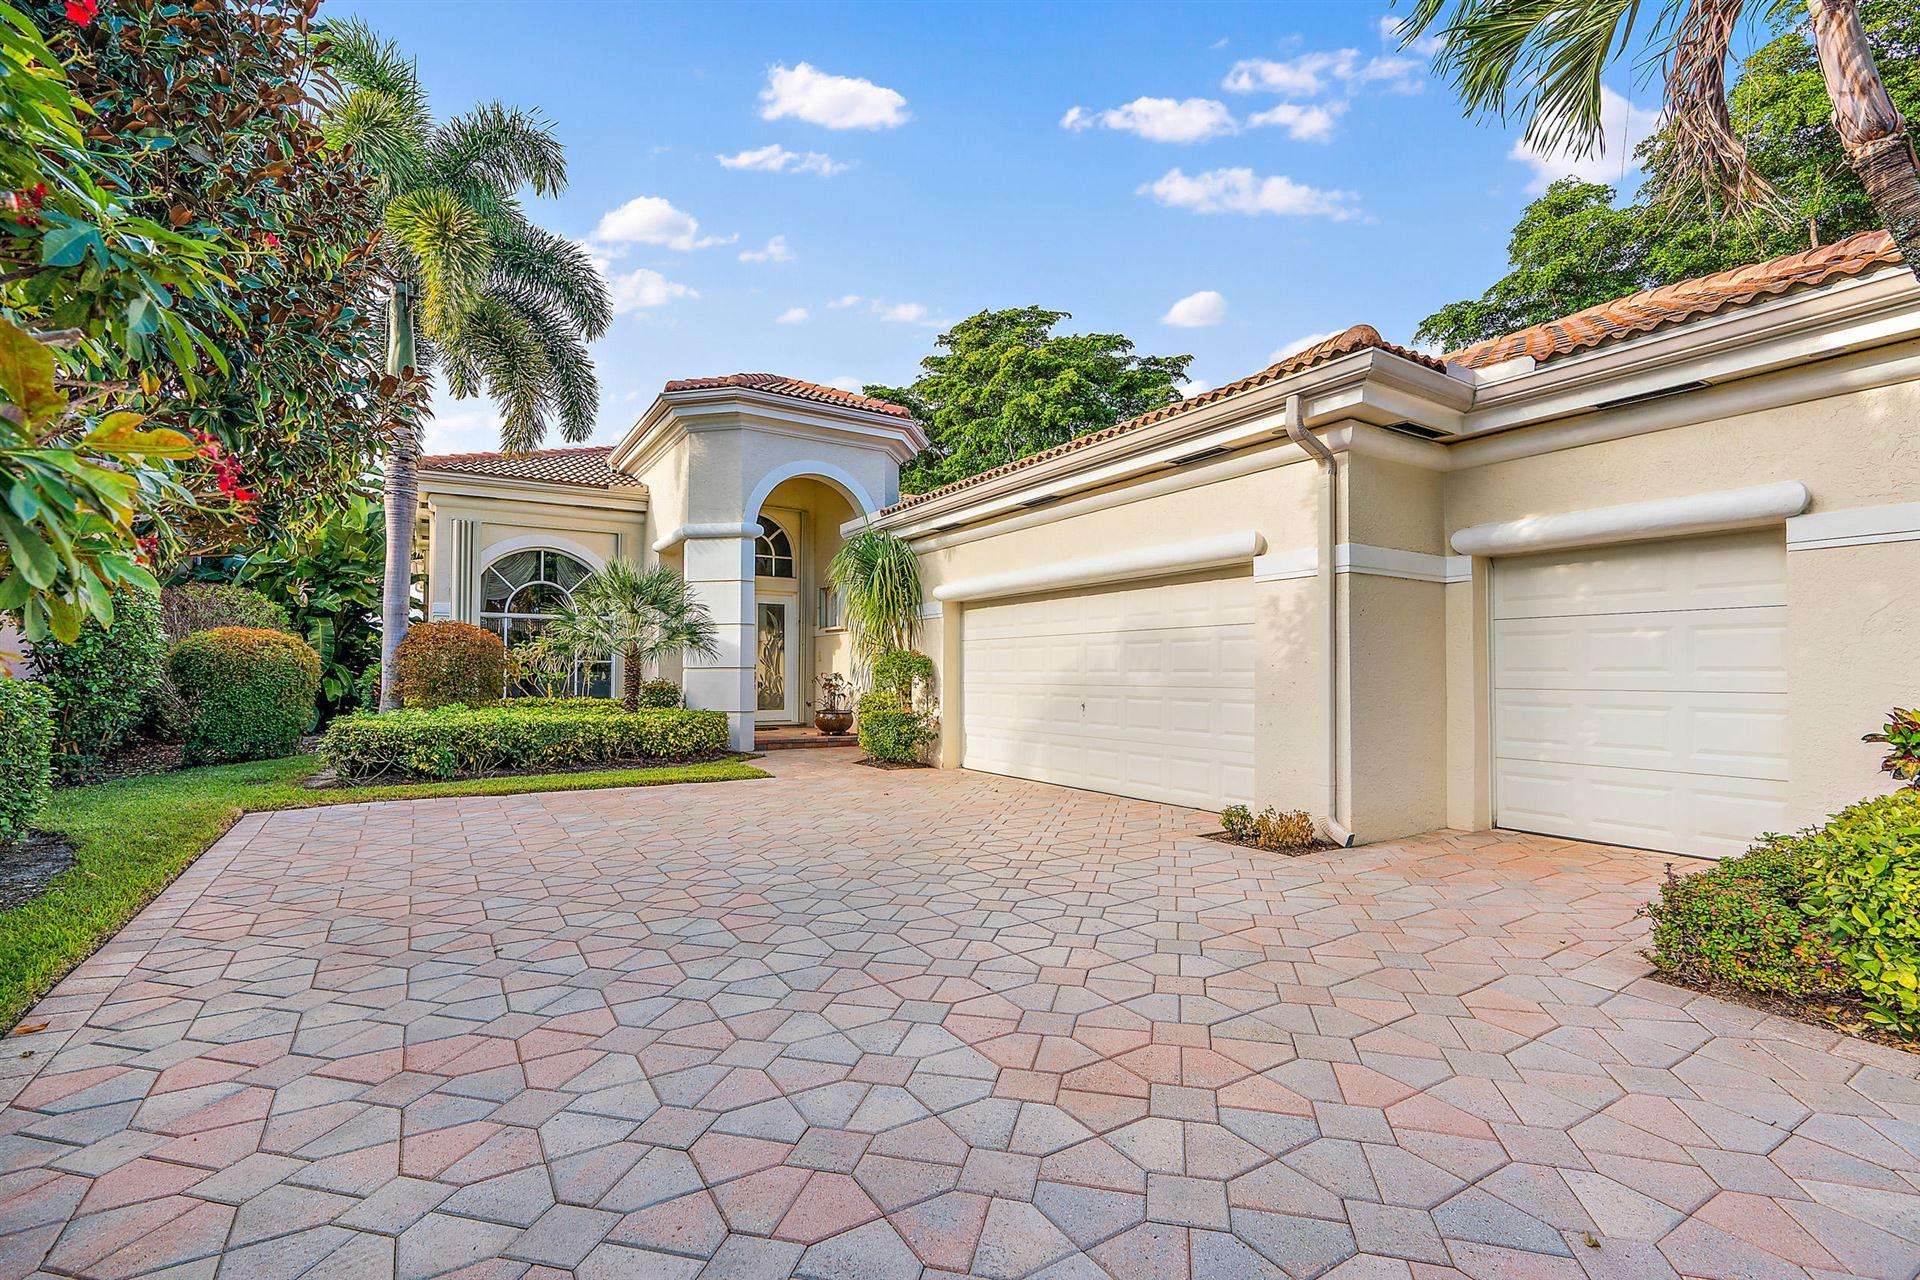 Photo of 279 Isle Way, Palm Beach Gardens, FL 33418 (MLS # RX-10646082)